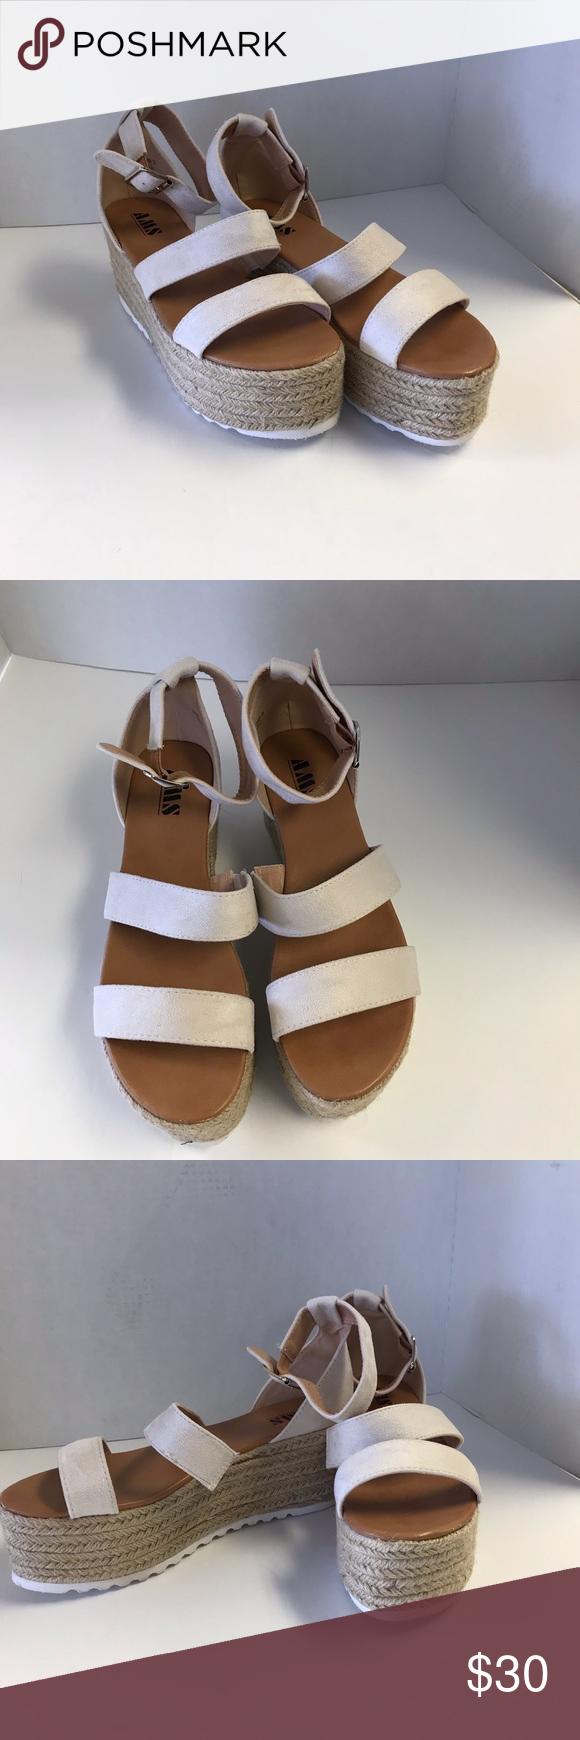 eb266386ca0 AMS Platform Wedge AMS Platform Wedge AMS Shoes Wedges